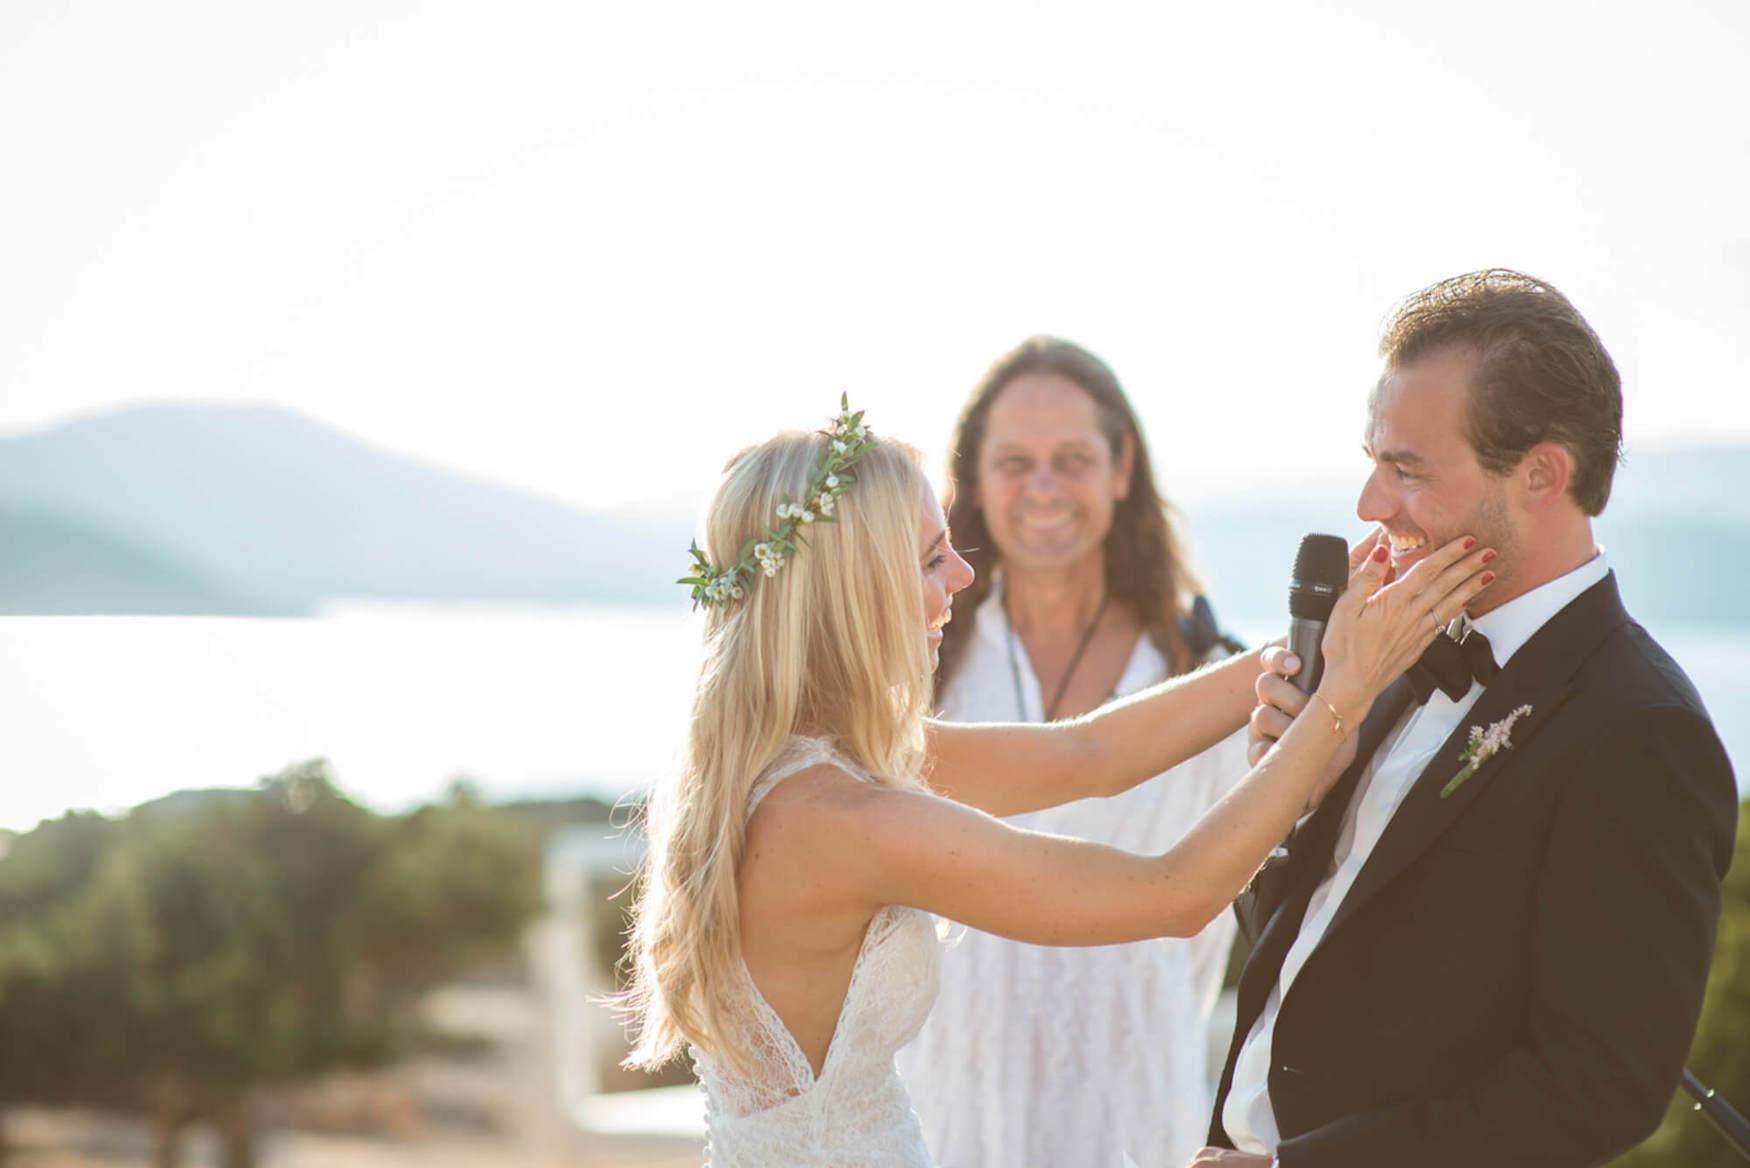 bride groom sunset ceremony laughter black tie flower crown pronovias